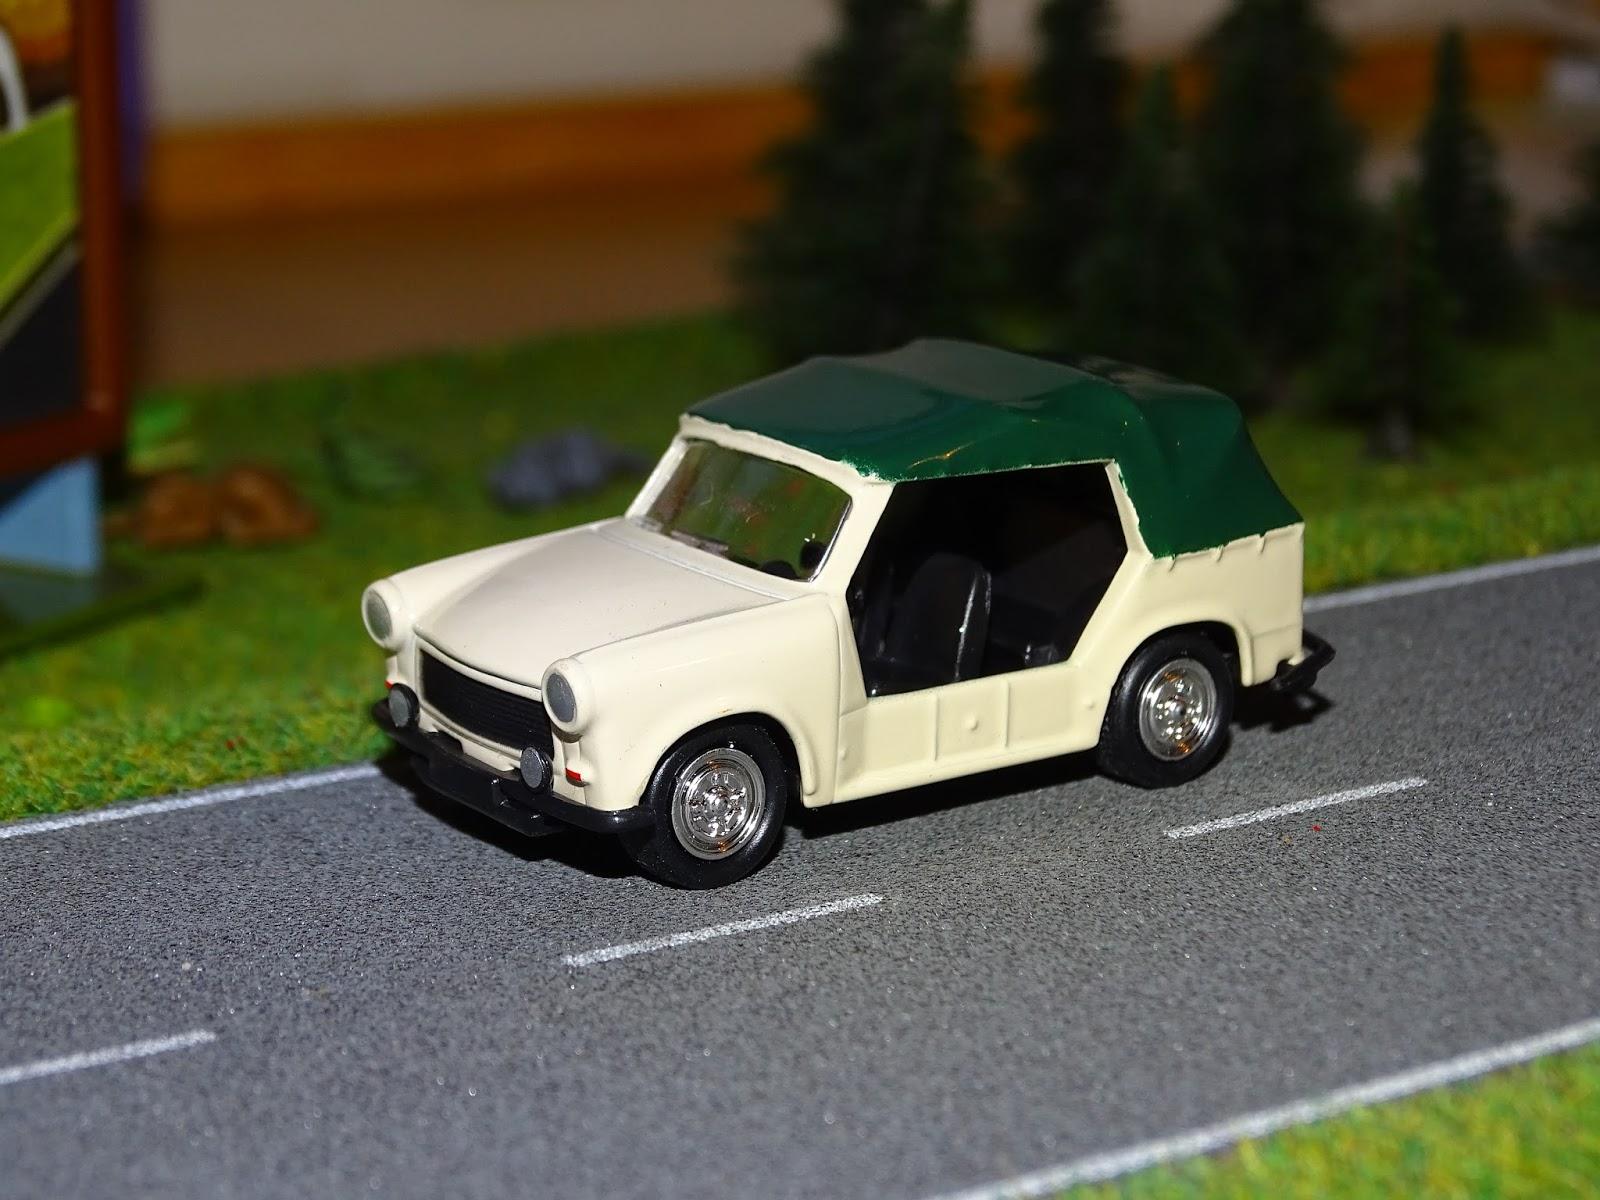 diecast cars 1 64 modellautos 1 64 modellbilar 1 64 new. Black Bedroom Furniture Sets. Home Design Ideas